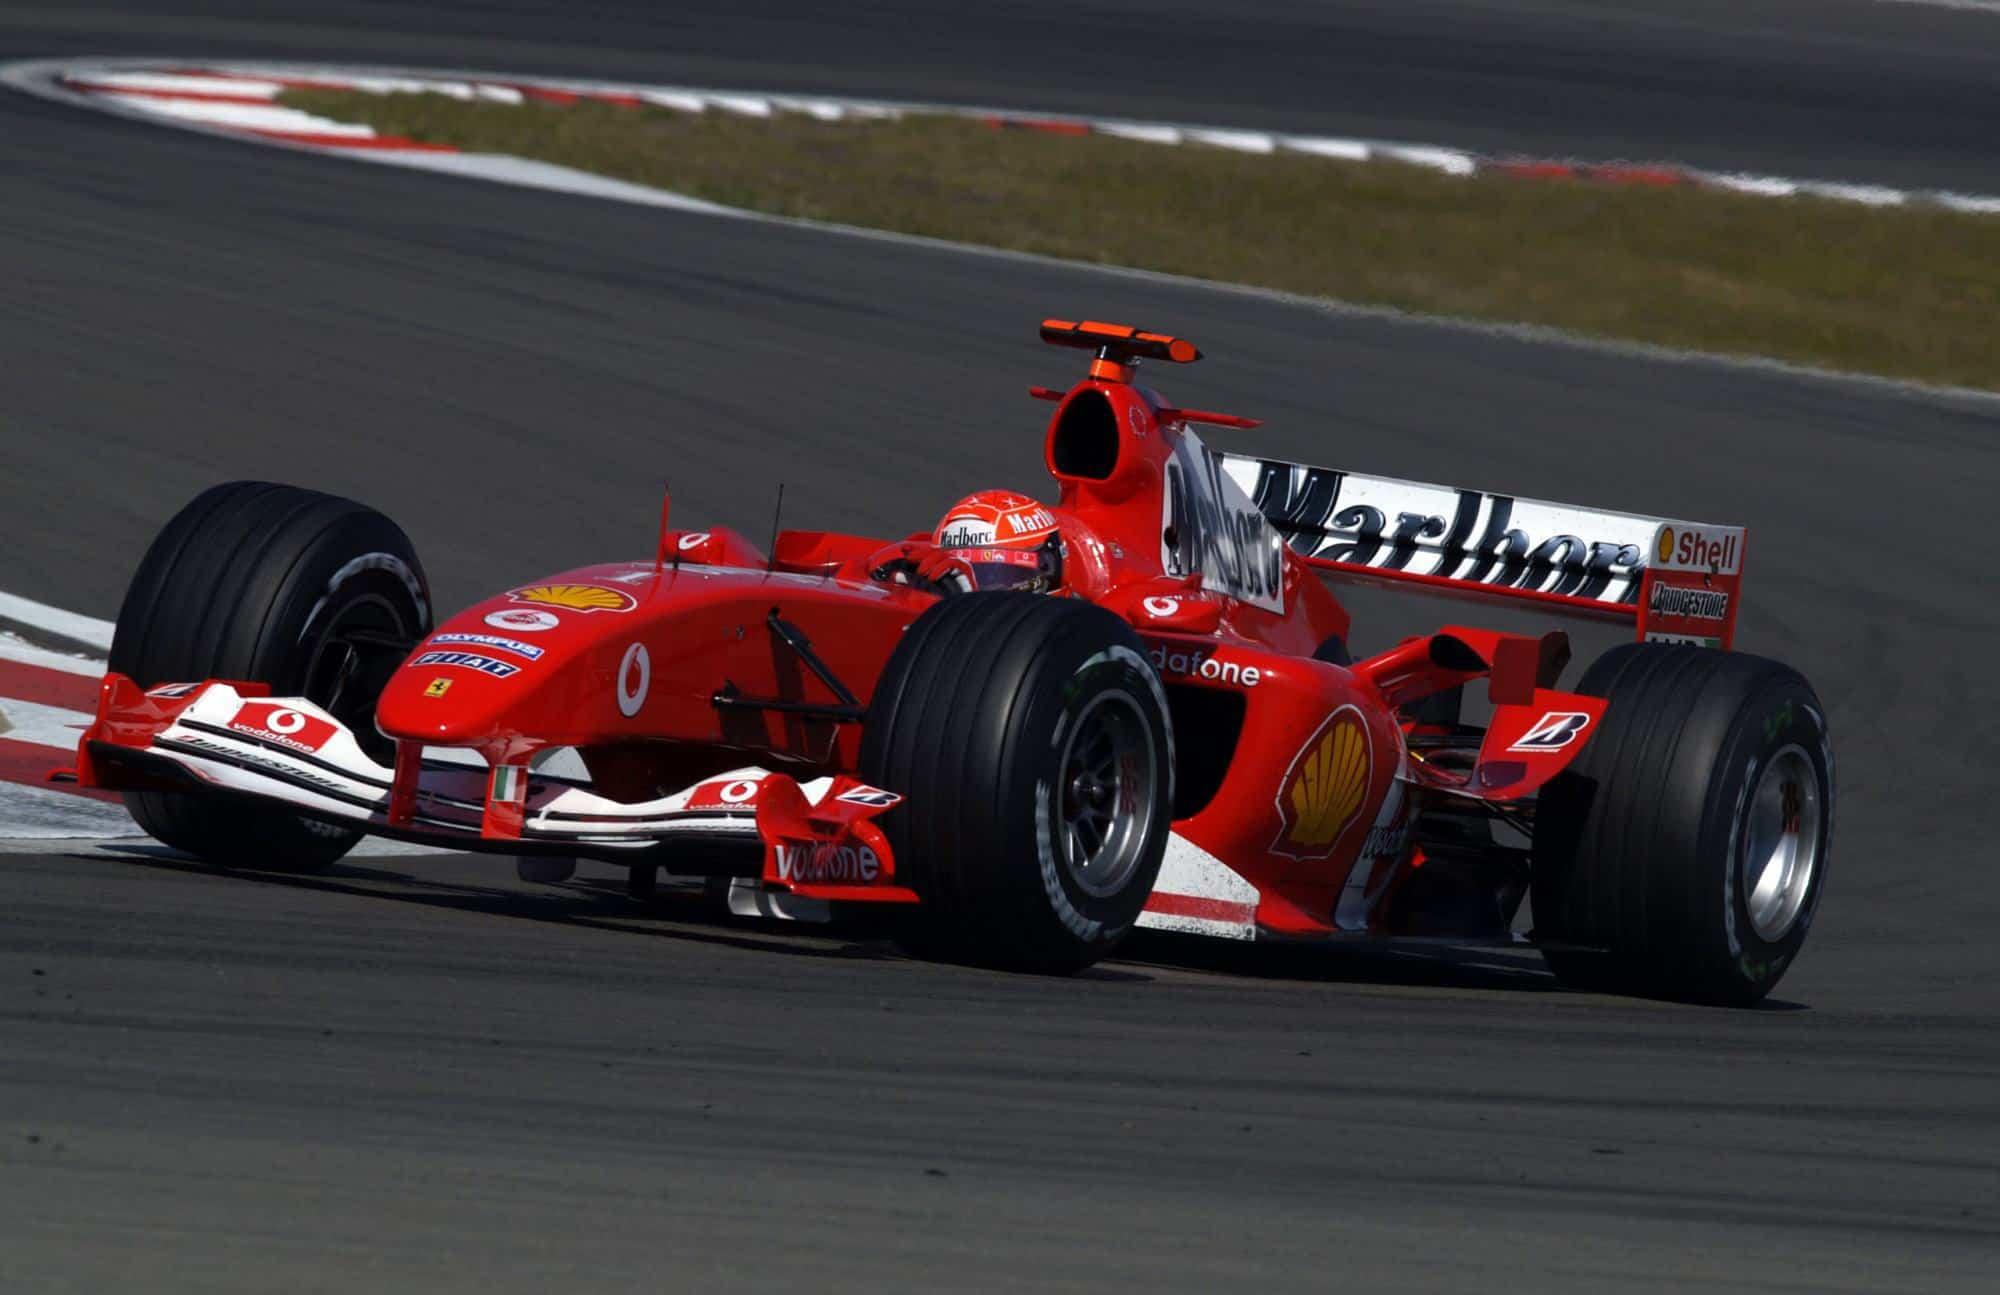 2004 European Gp Schumacher Dominates In His 200th F1 Race